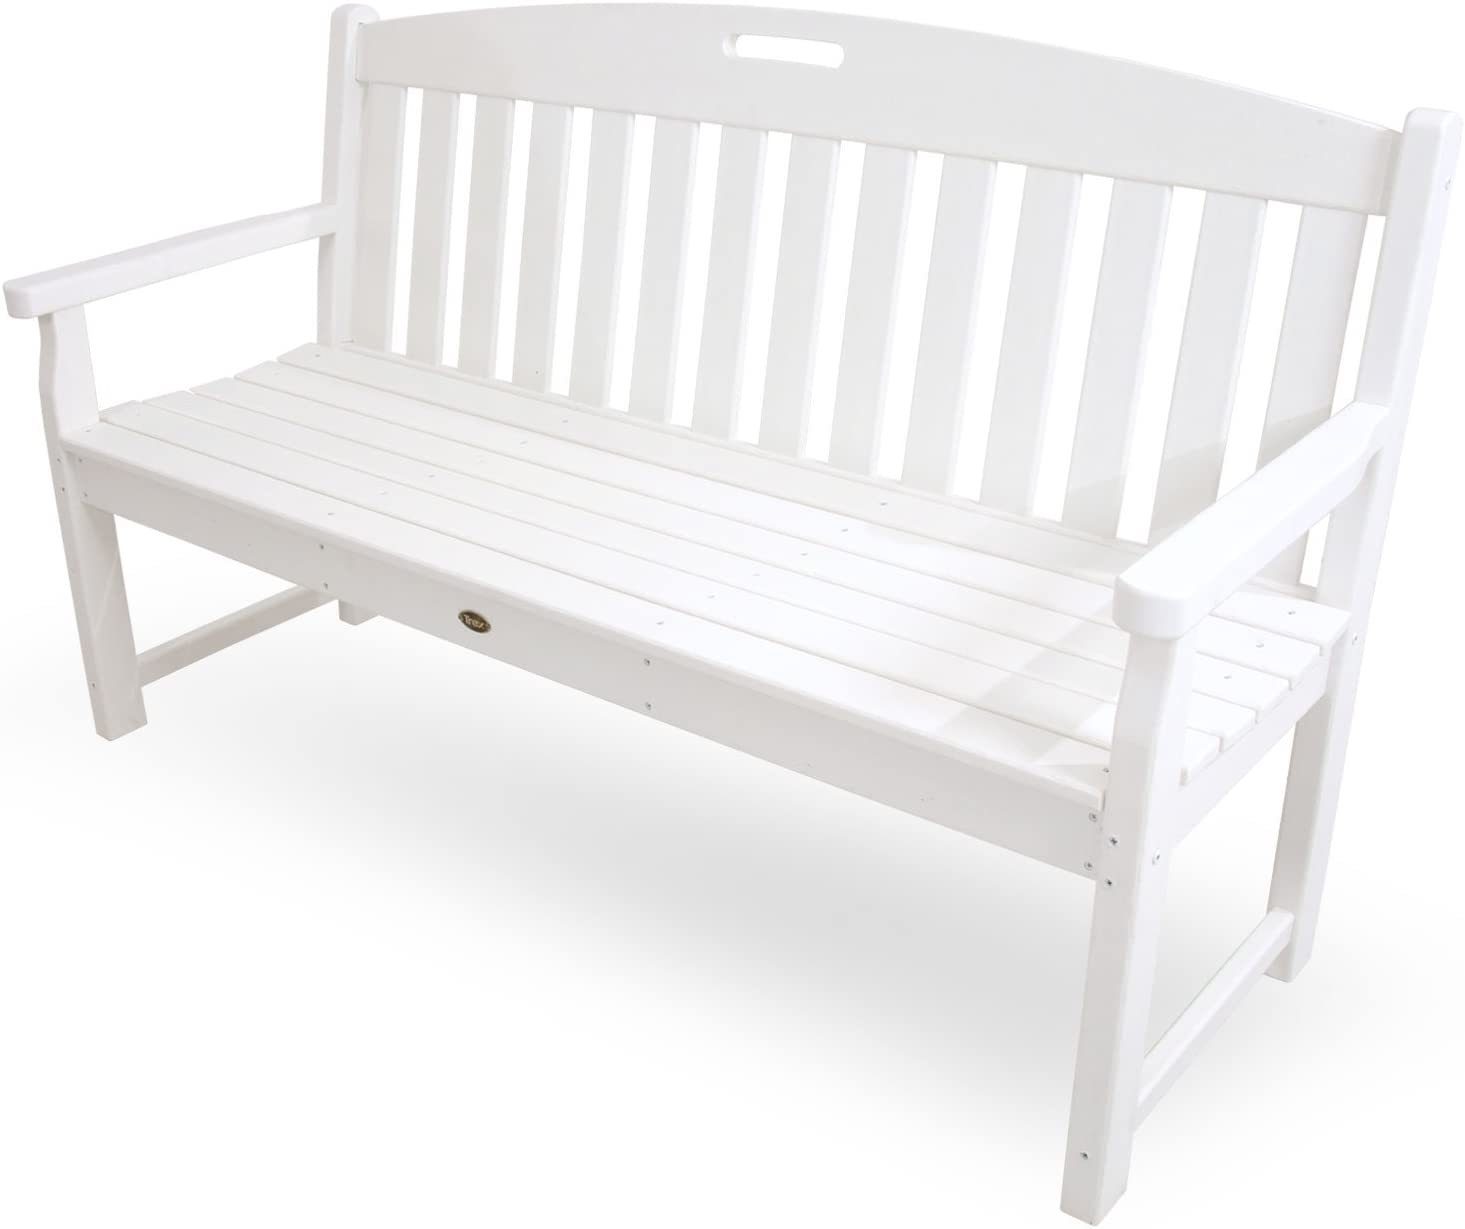 Trex Outdoor Furniture TXB60CW 60-Inch Yacht Club Bench, Classic White